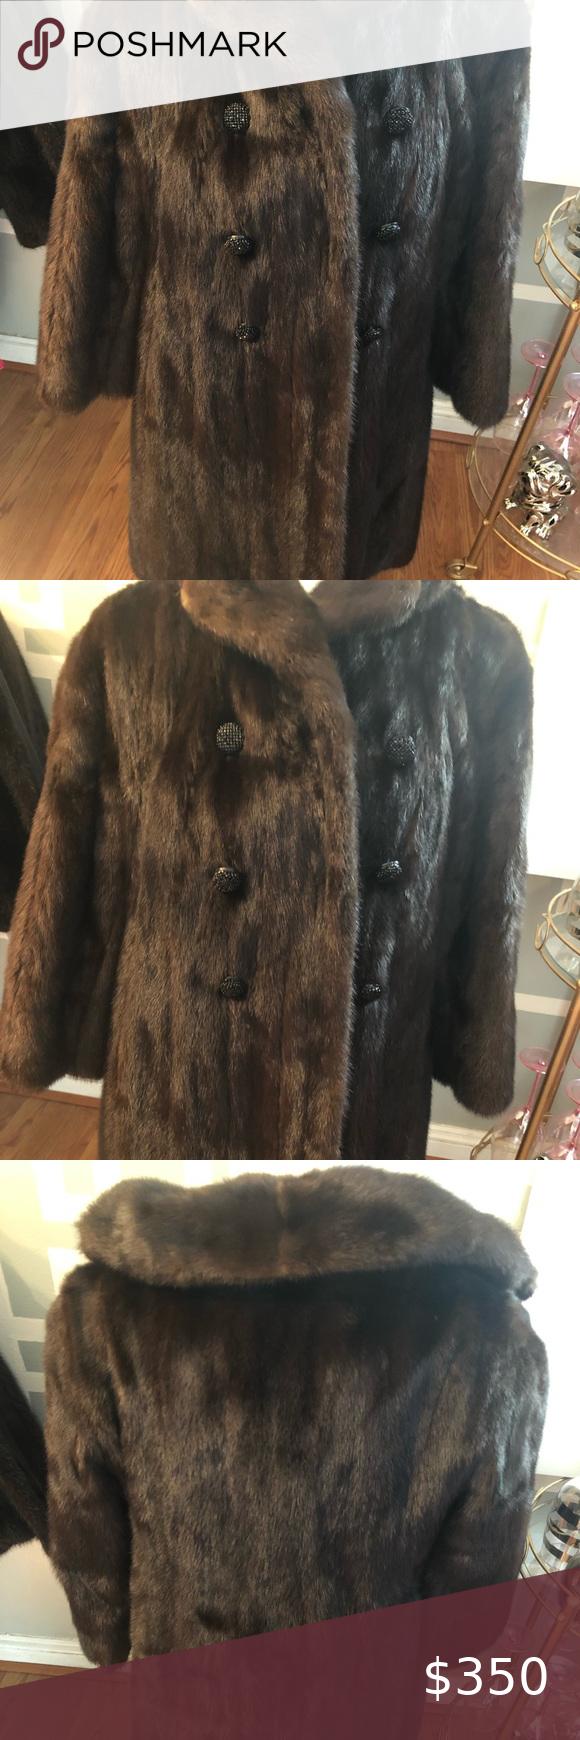 Vintage Mink Coat With Stone Buttons Mink Coat Vintage Coat Vintage [ 1740 x 580 Pixel ]